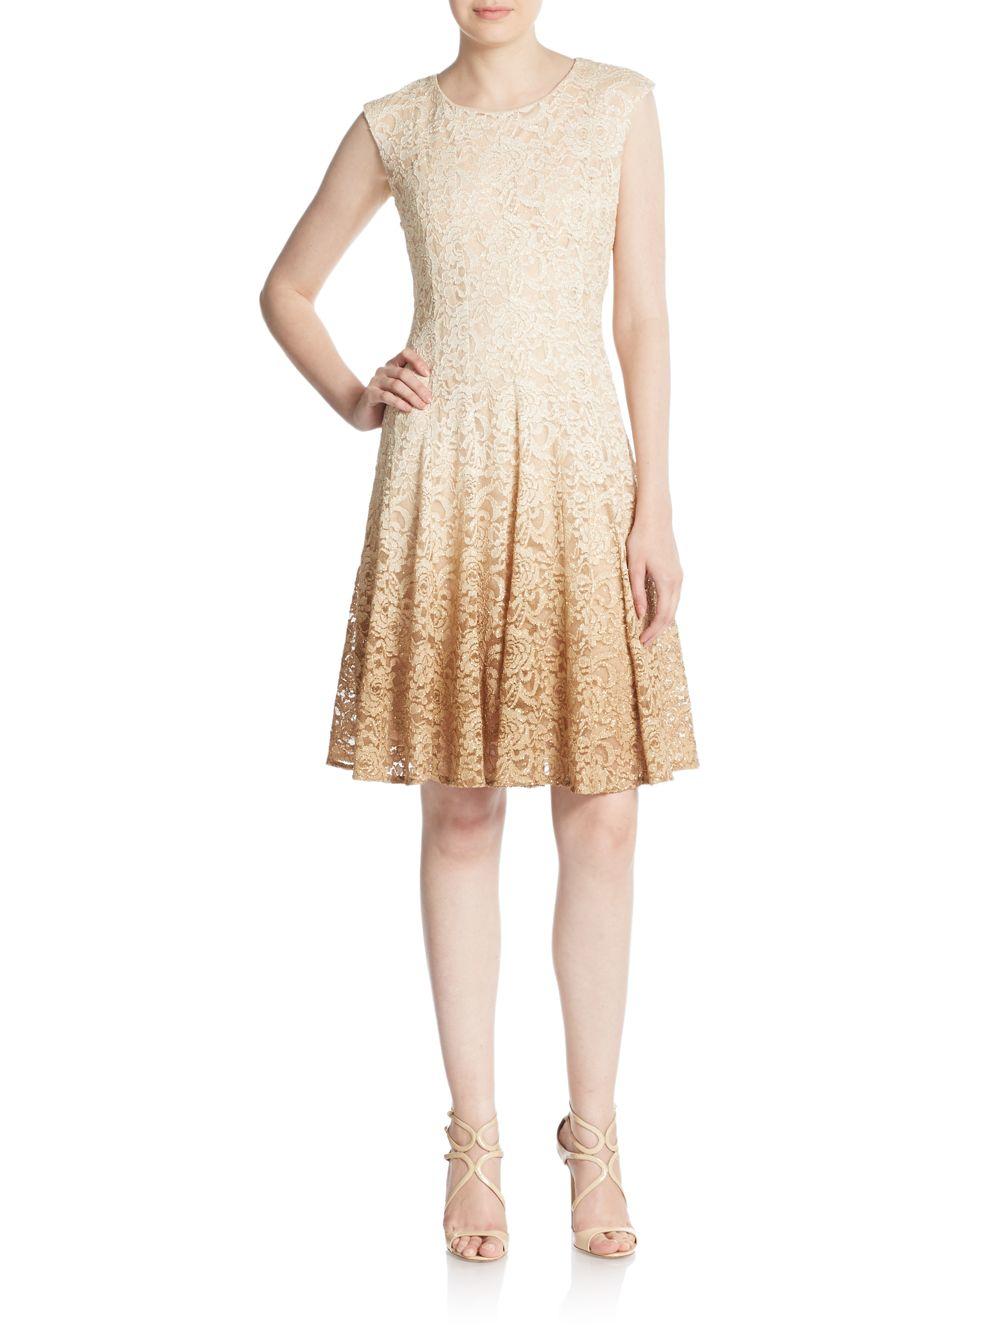 bad32be8 Chetta B Glitter Lace Fit-and-flare Dress in Metallic - Lyst